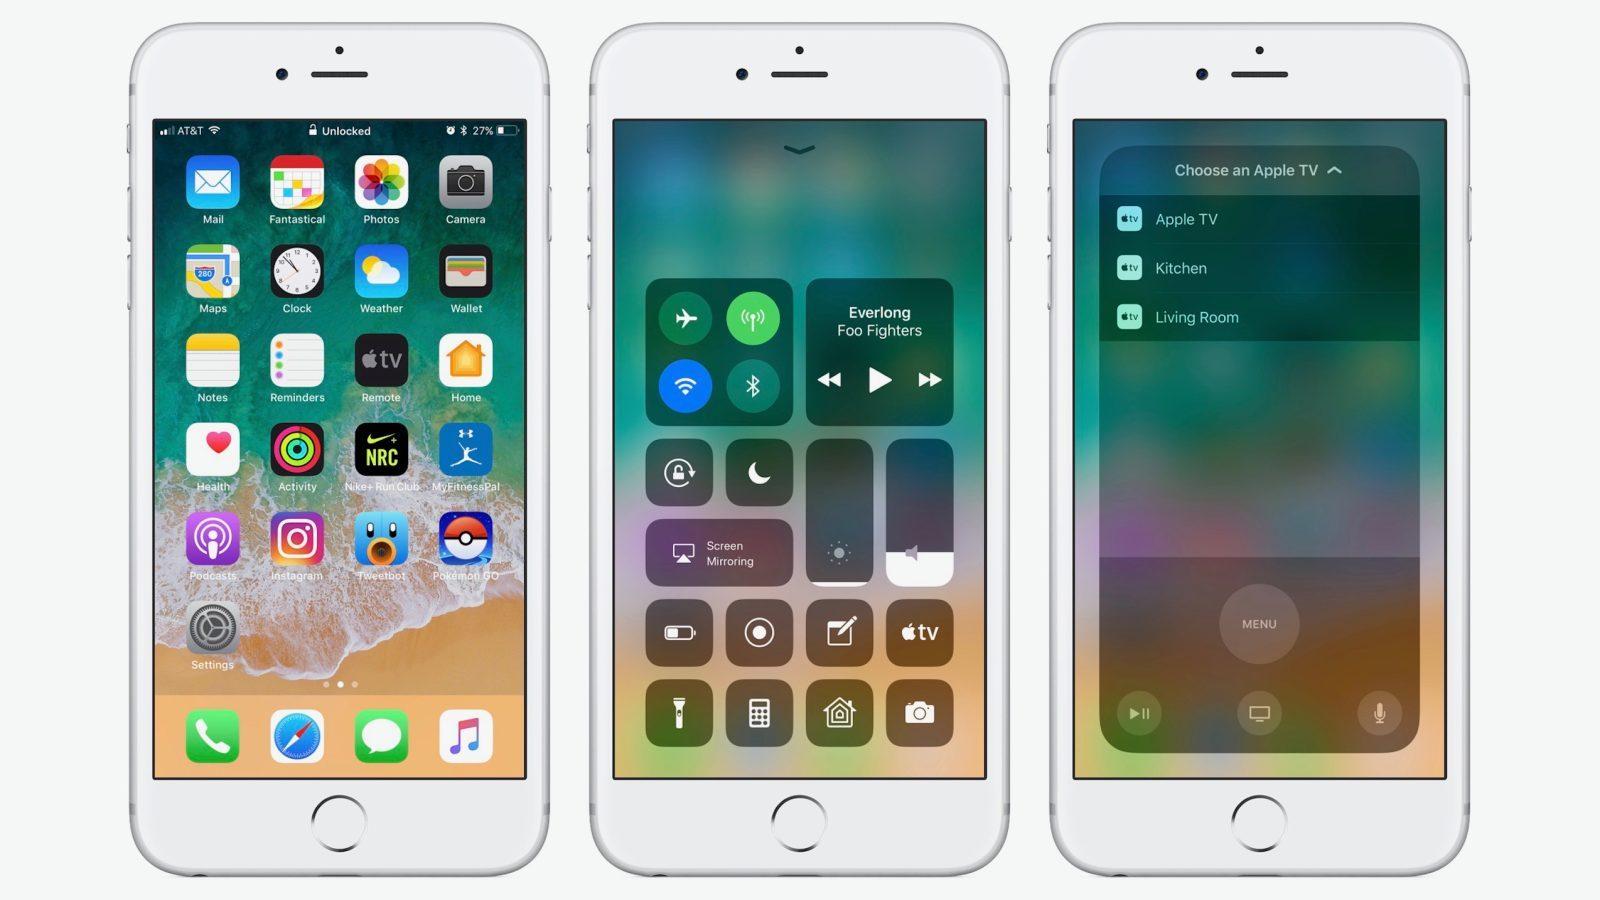 iOS 11估计是史上BUG最多的一个大版本迭代